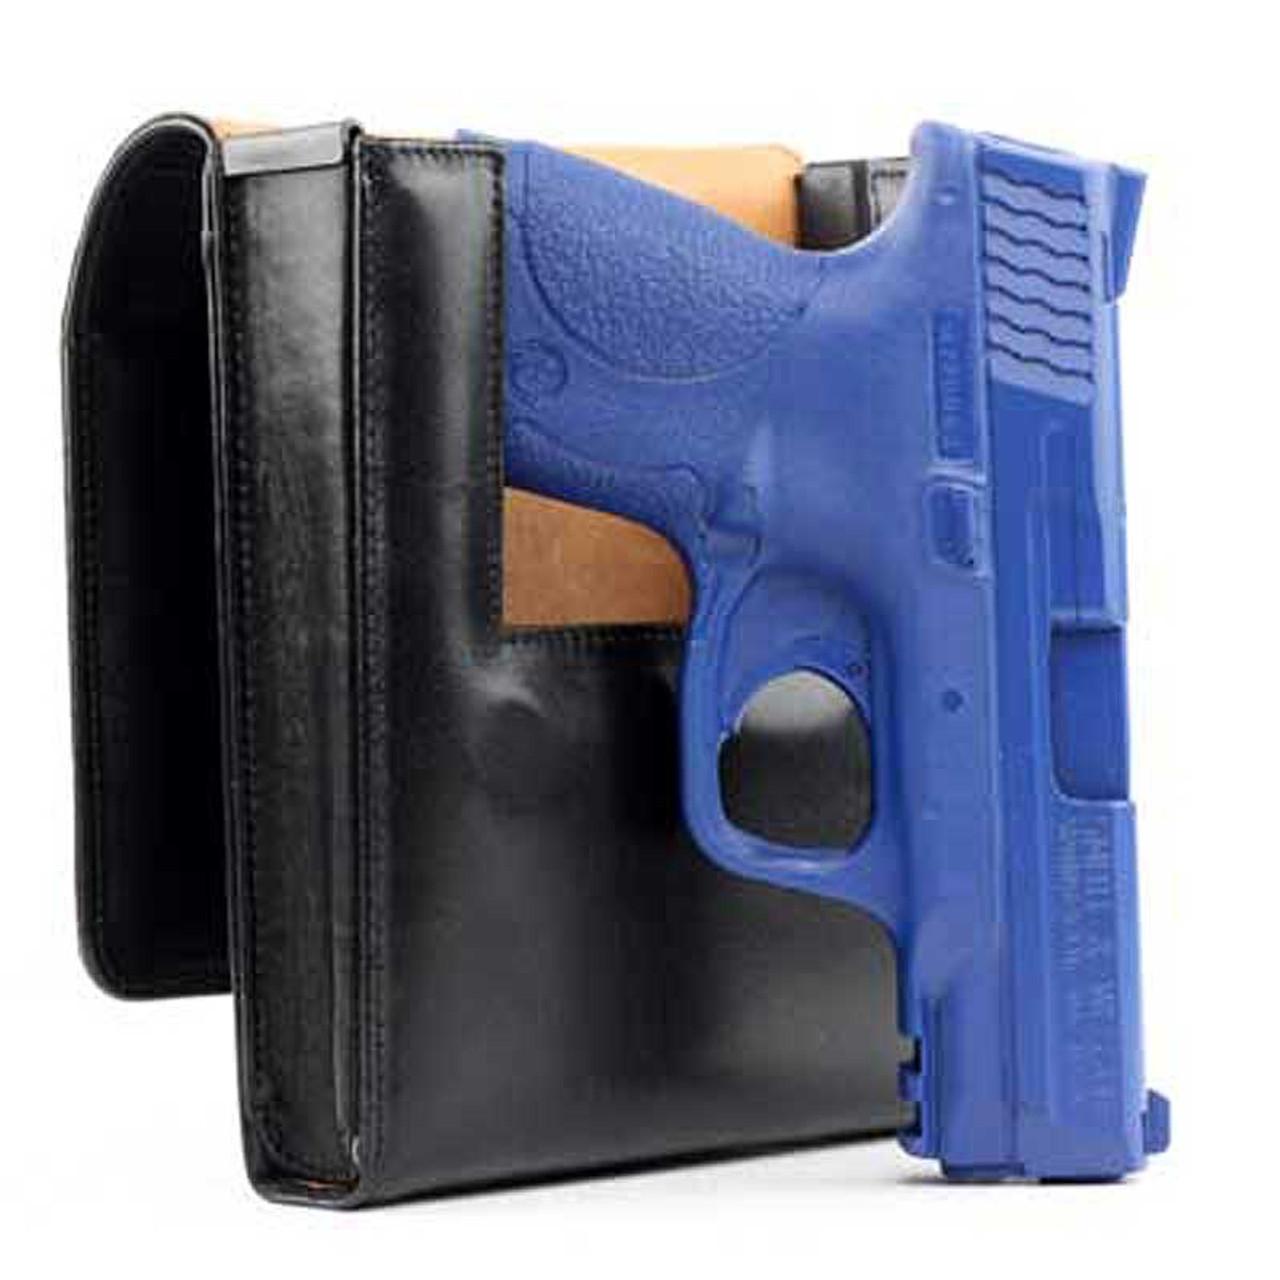 M&P 40c Concealed Carry Holster (Belt Loop)